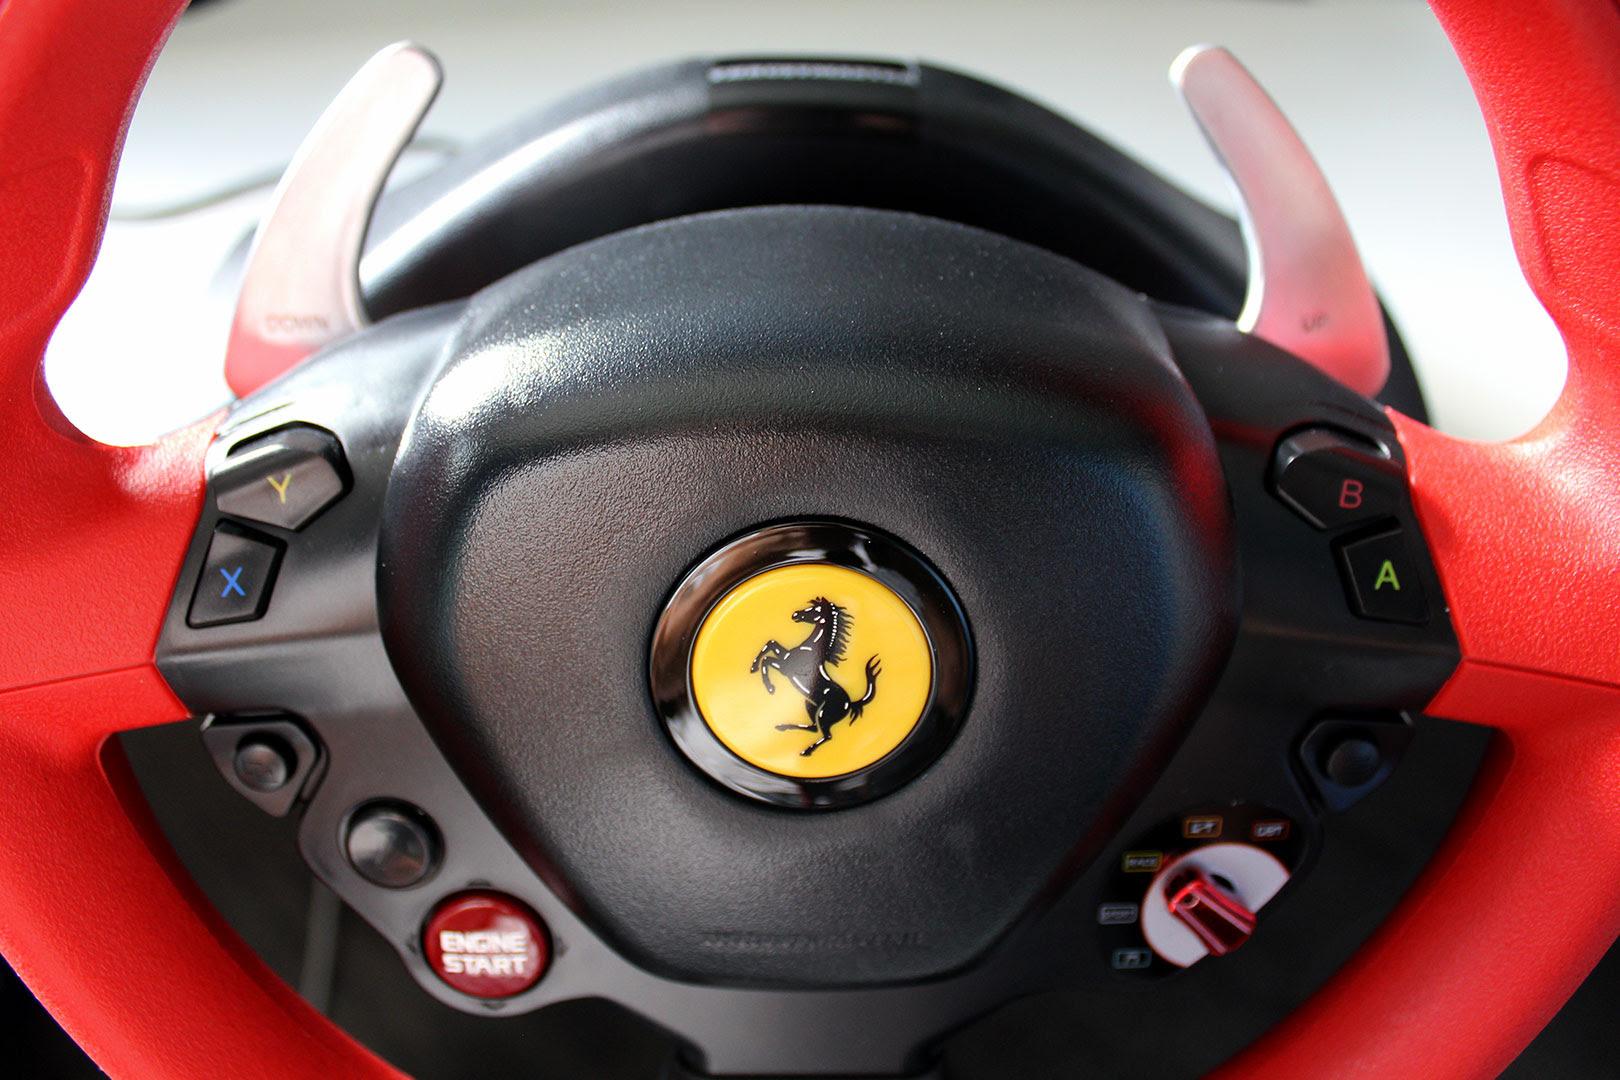 Thrustmaster Ferrari 458 Spider Racing Wheel : Test complet - Volant - Les Numériques